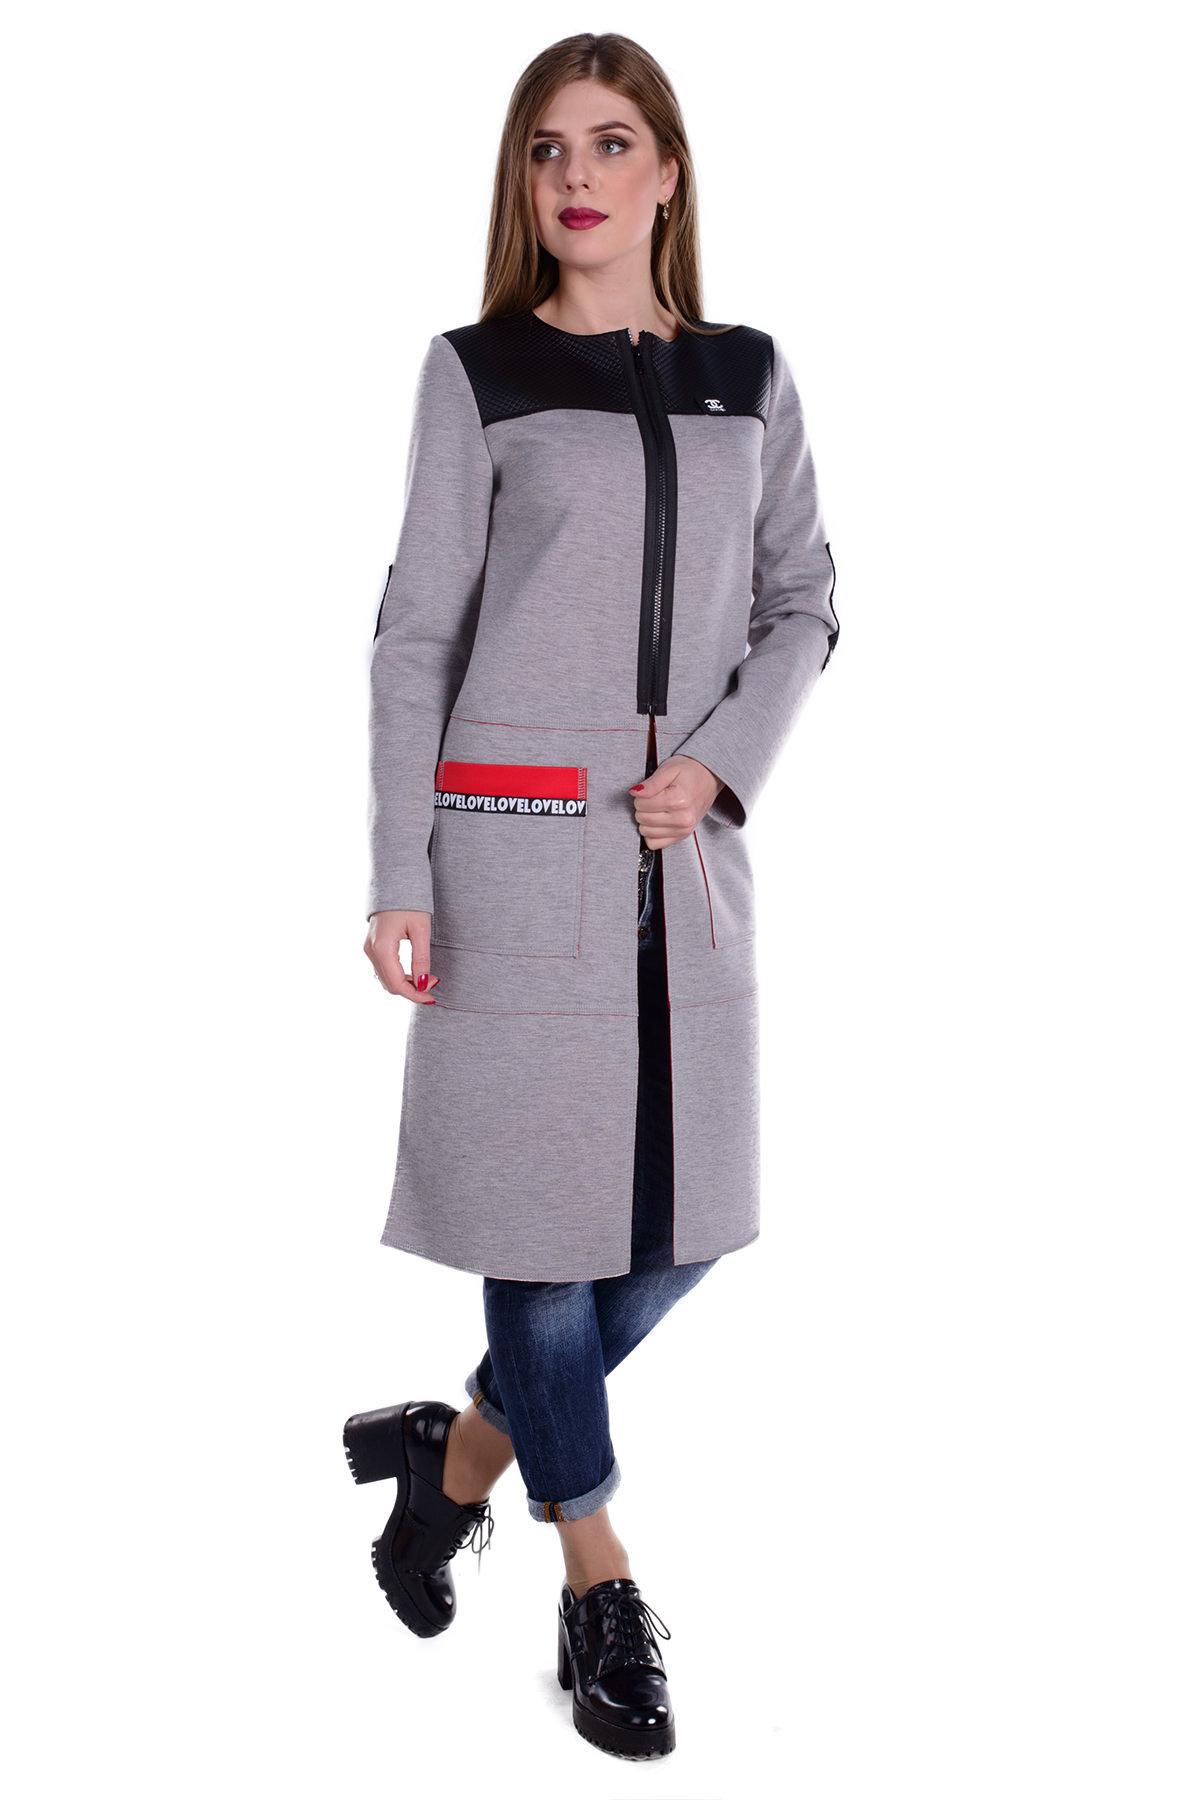 Купить оптом женские куртки от Modus Кардиган Фози неопрен